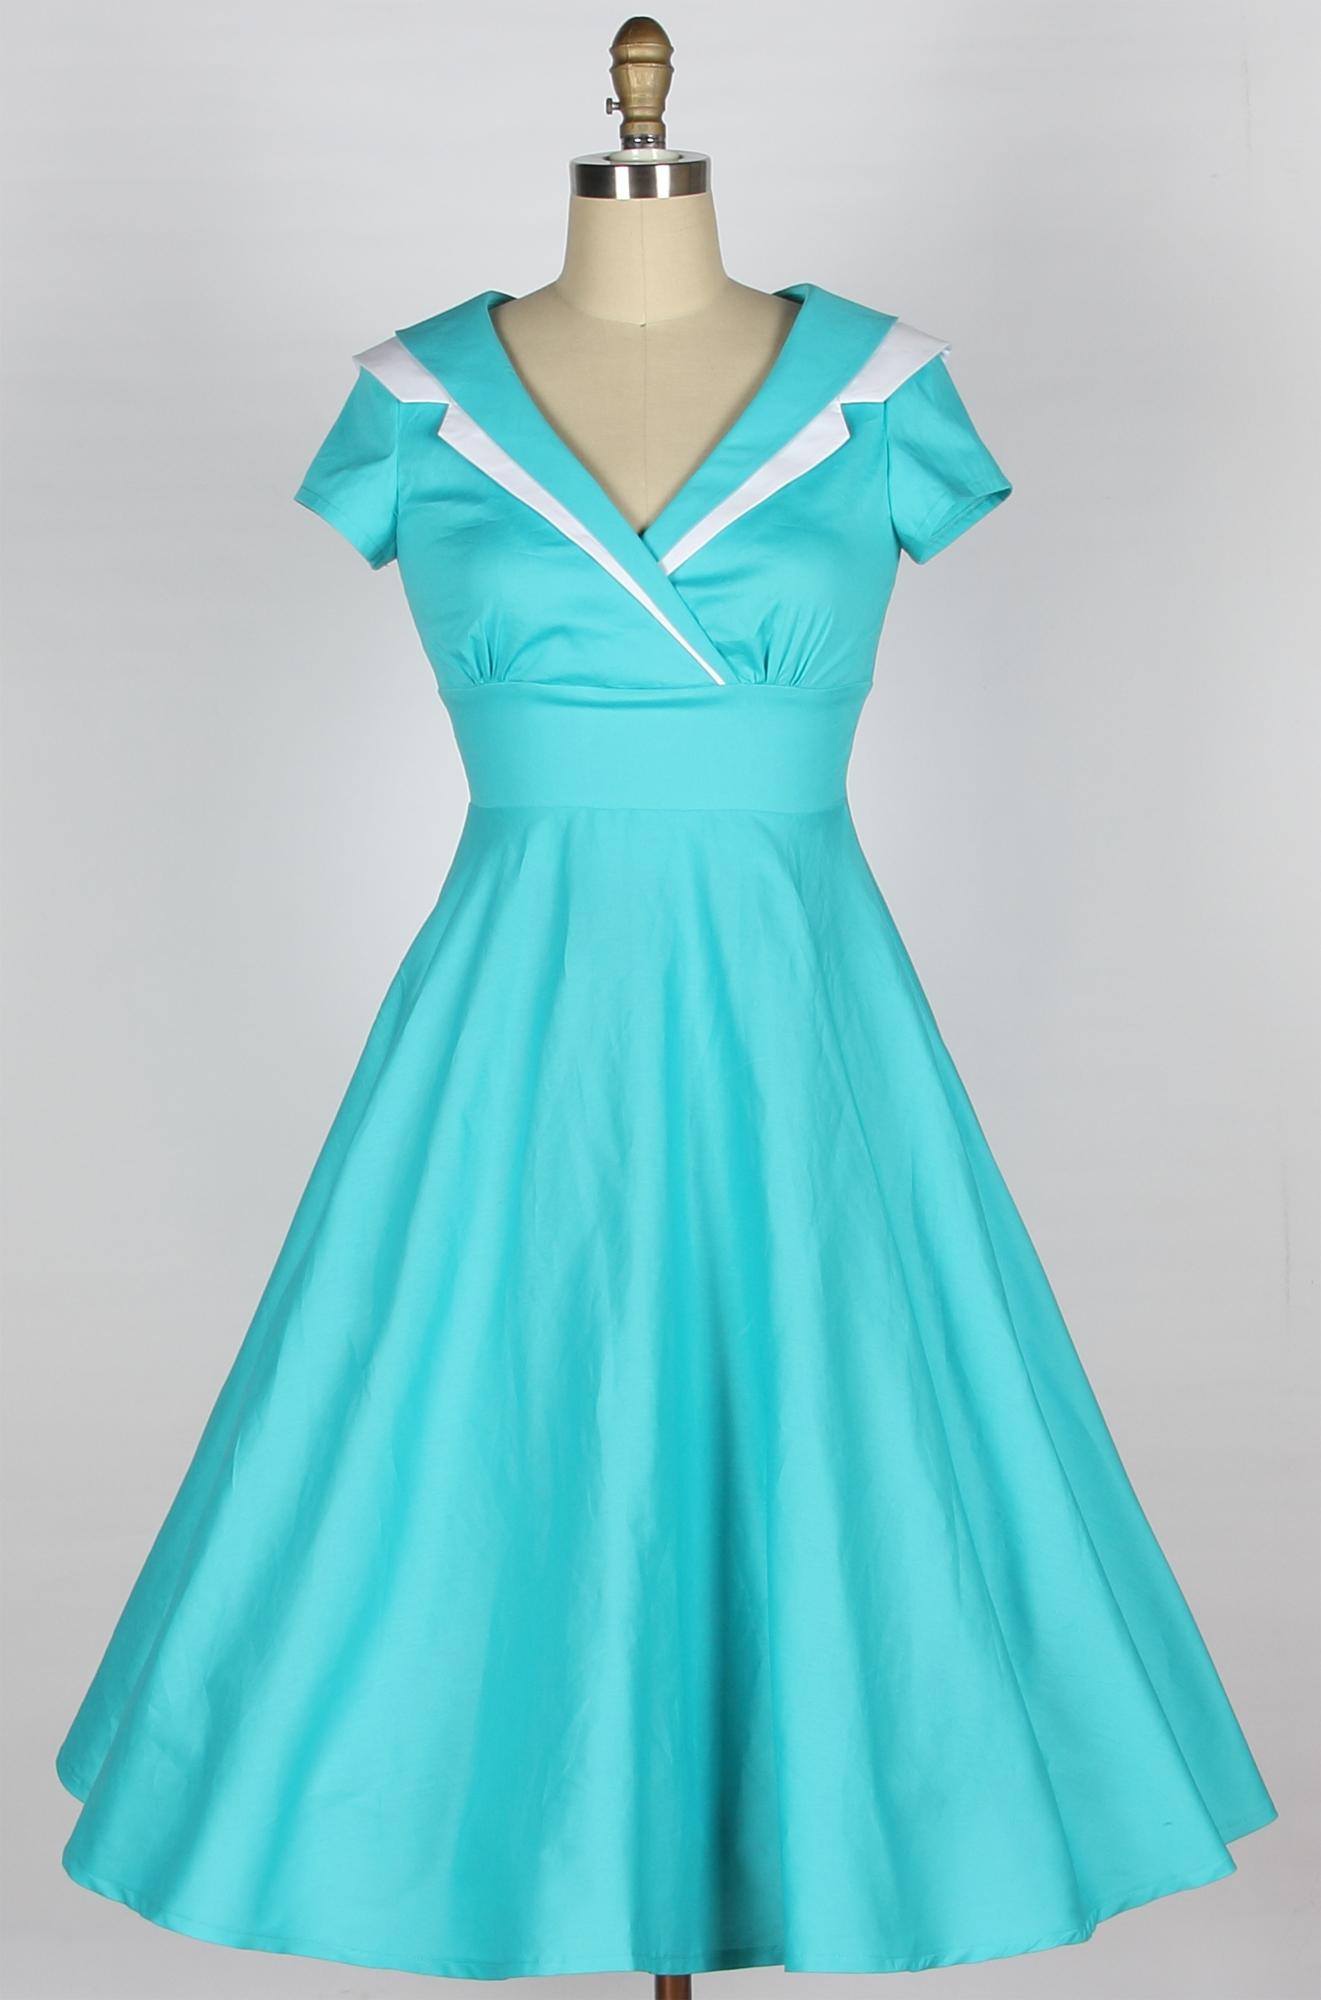 cotton dresses free dress patterns for women | home :: 1950s dresses :: 40s 50s jkxxkgb